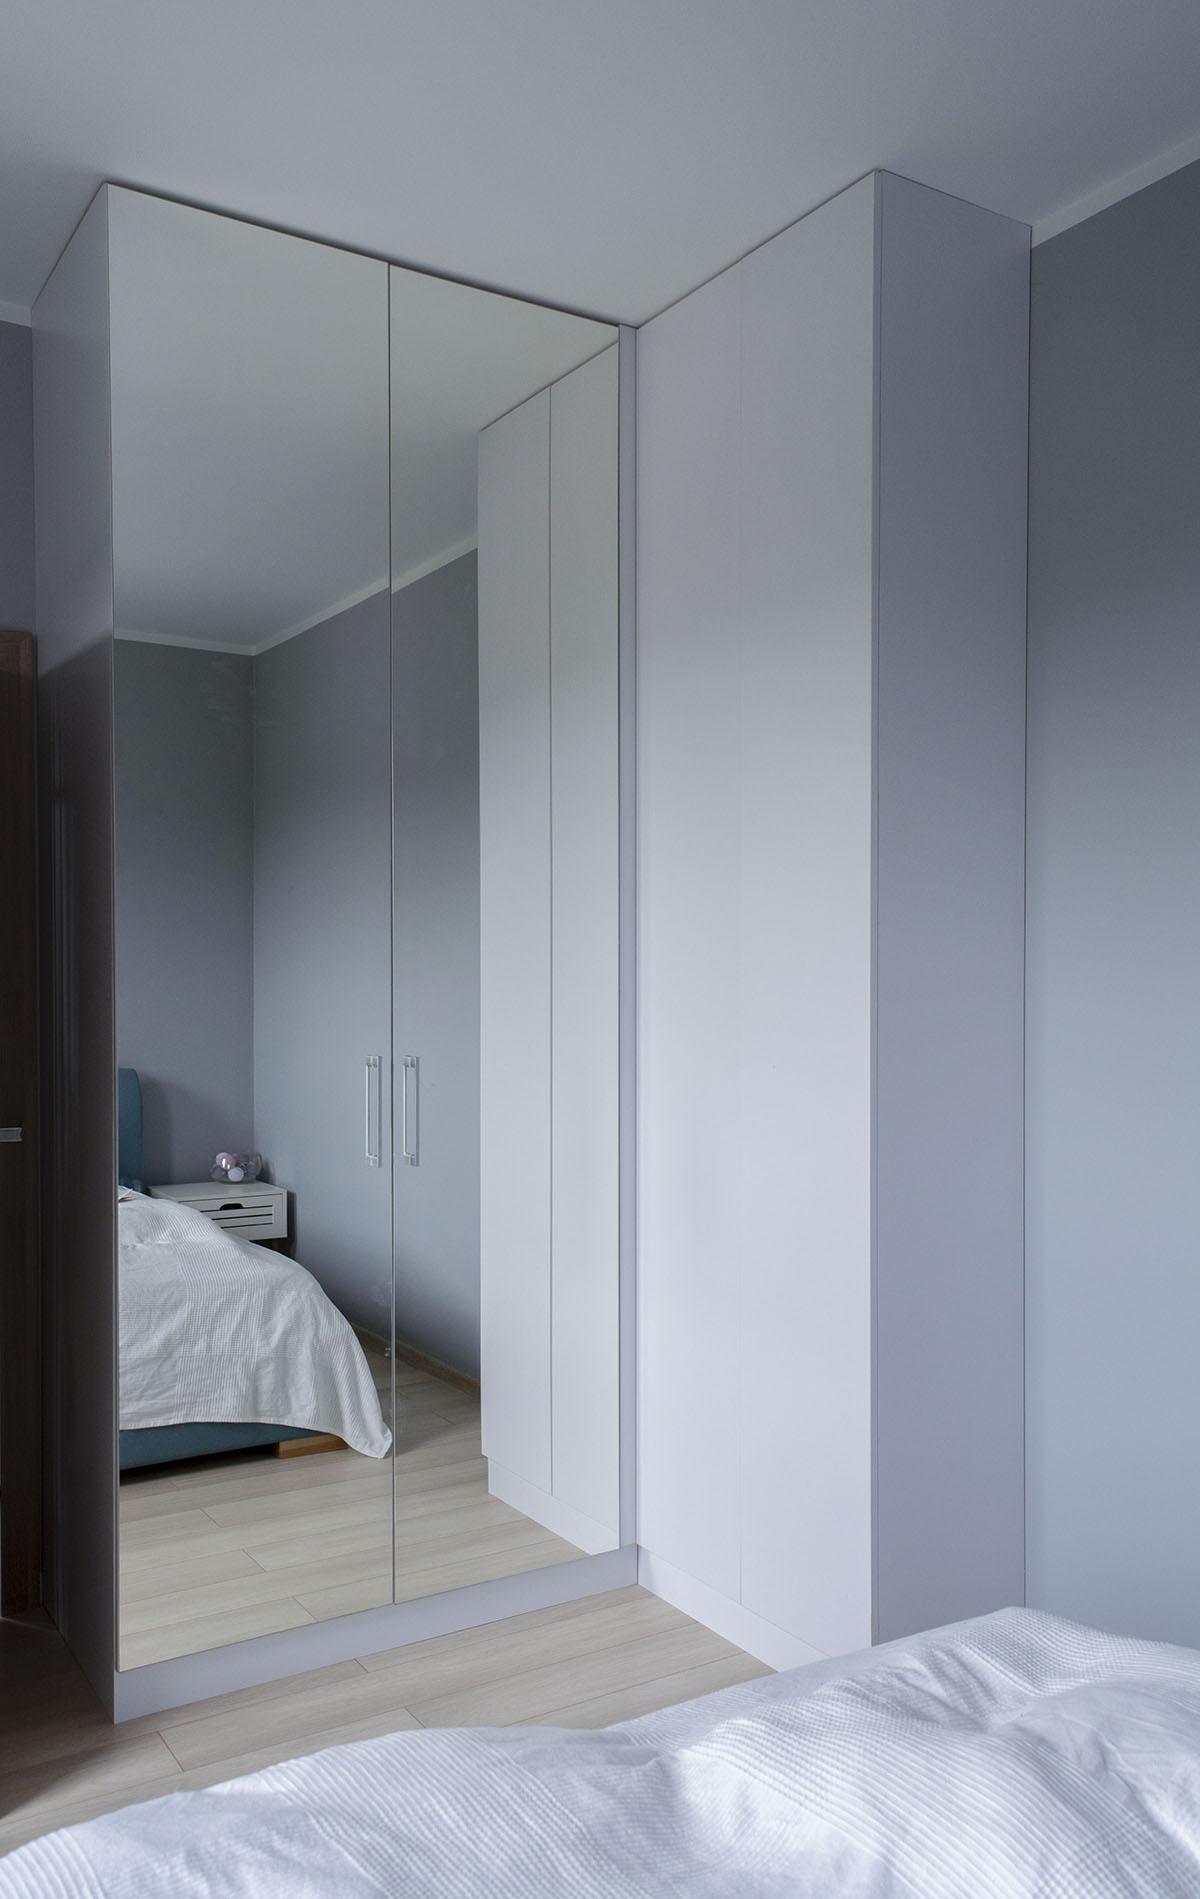 Sypialnia Z Szafa